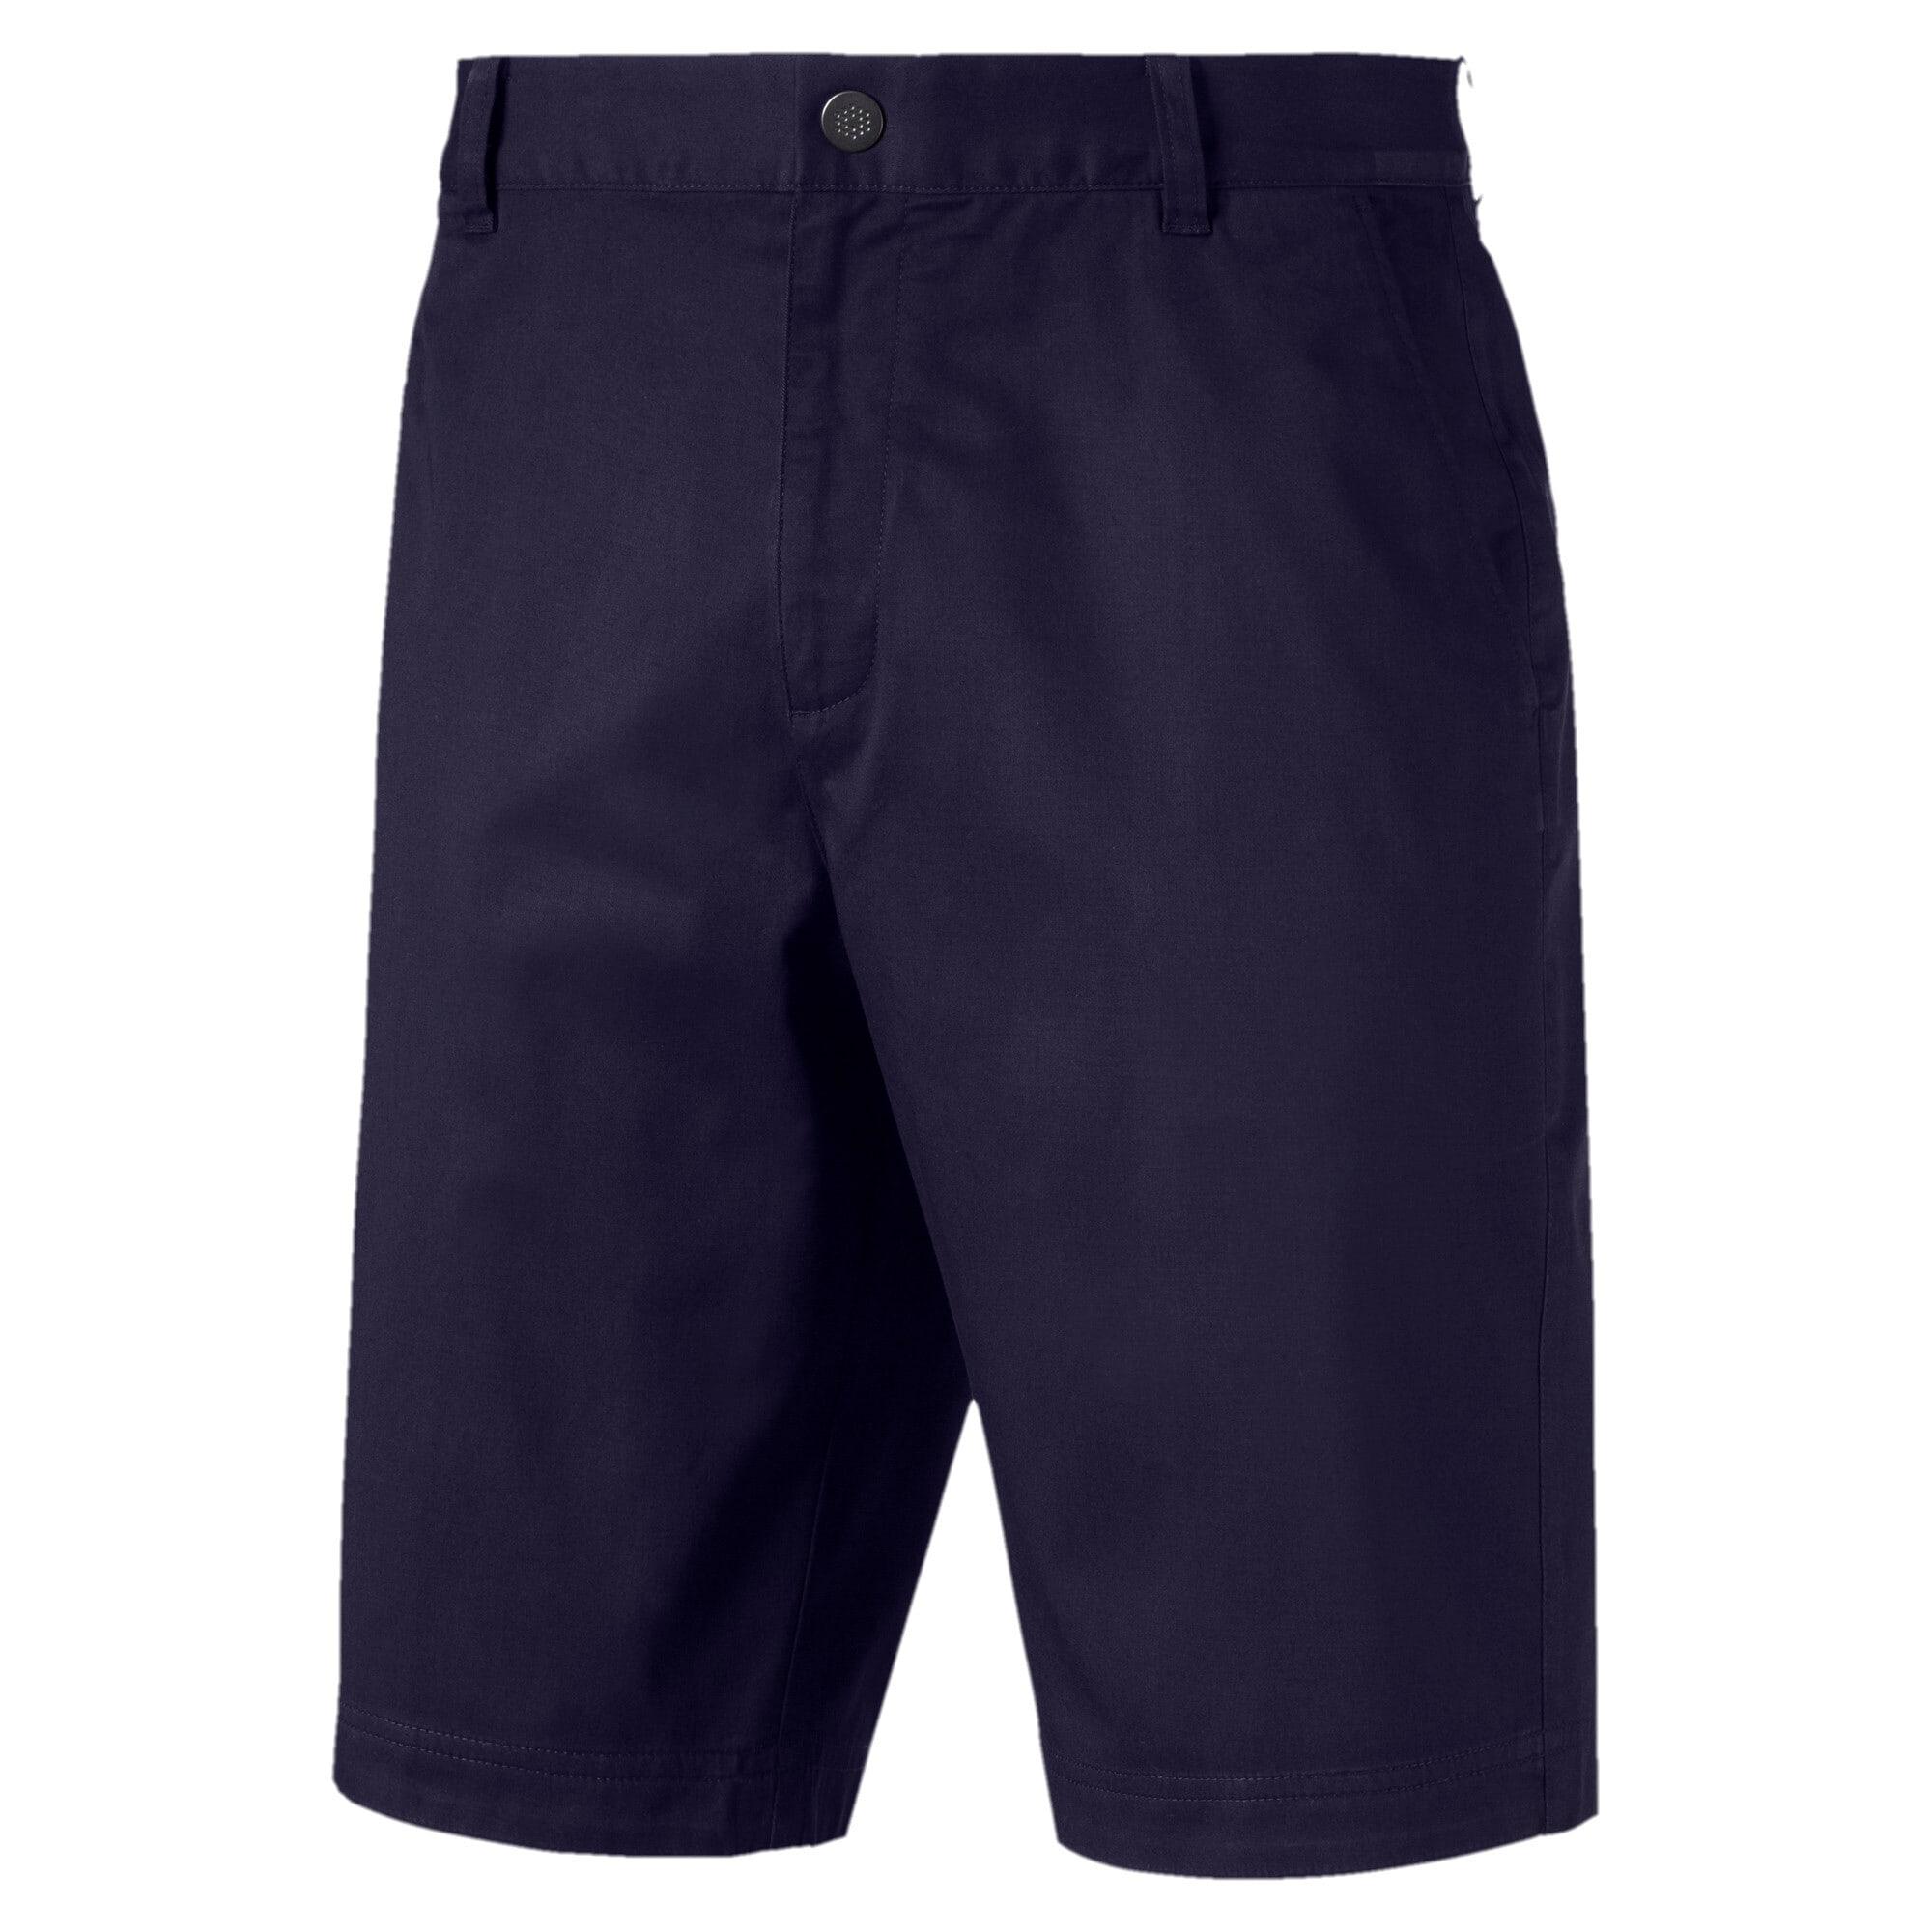 Thumbnail 1 of Aloha Men's Golf Shorts, Peacoat, medium-IND